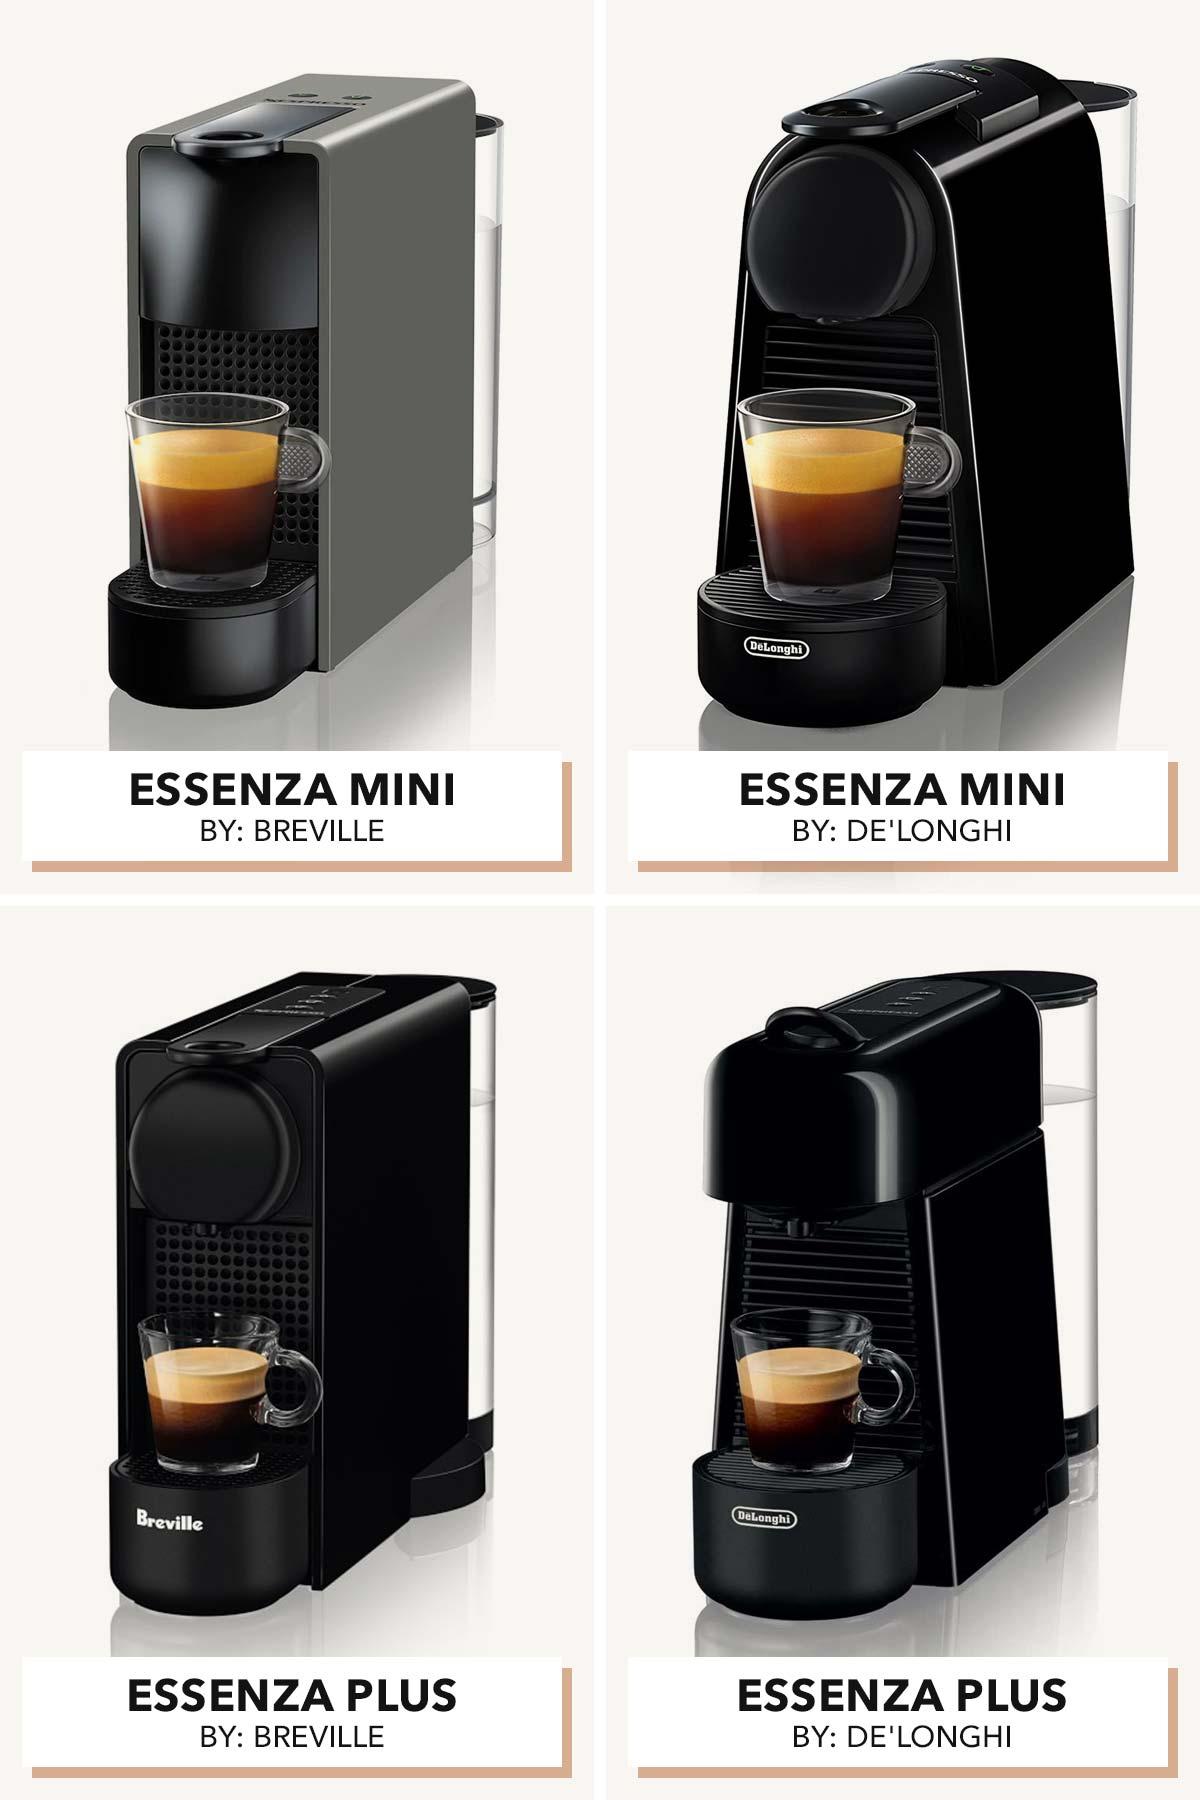 Four Nespresso Essenza models by Breville and De'Longhi.